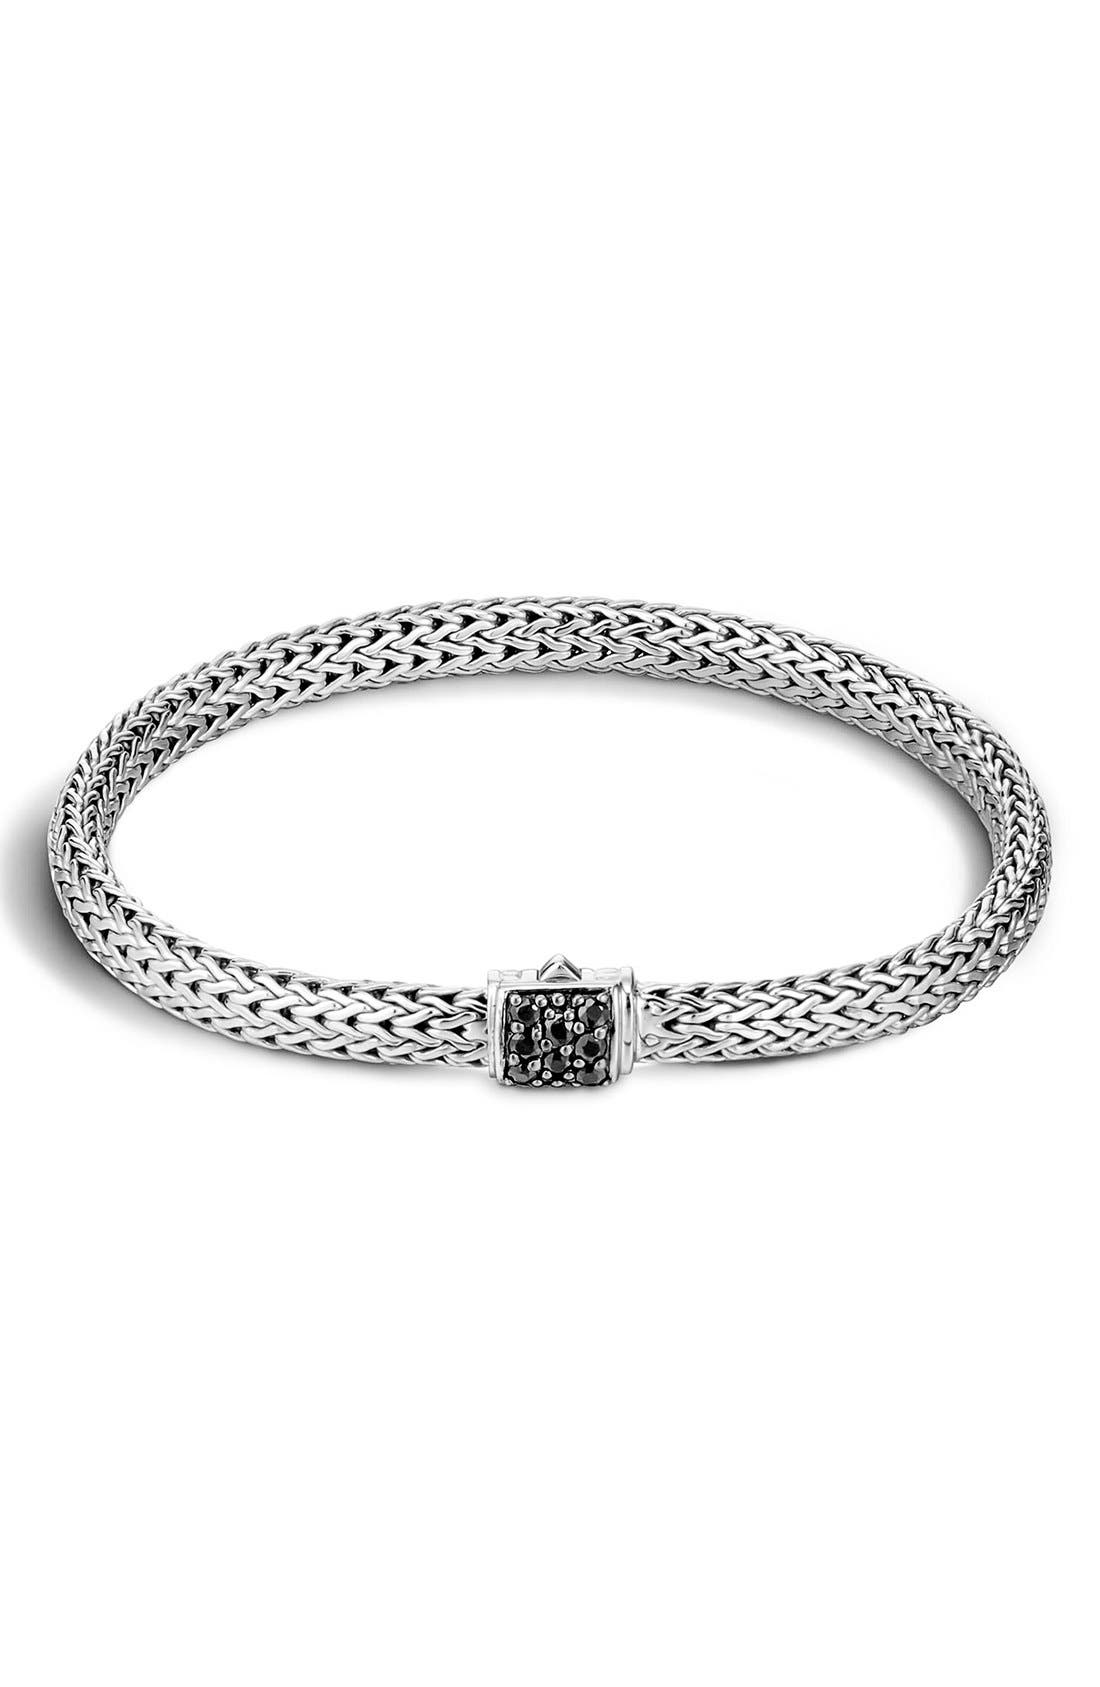 John Hardy 'Classic Chain' Extra Small Bracelet